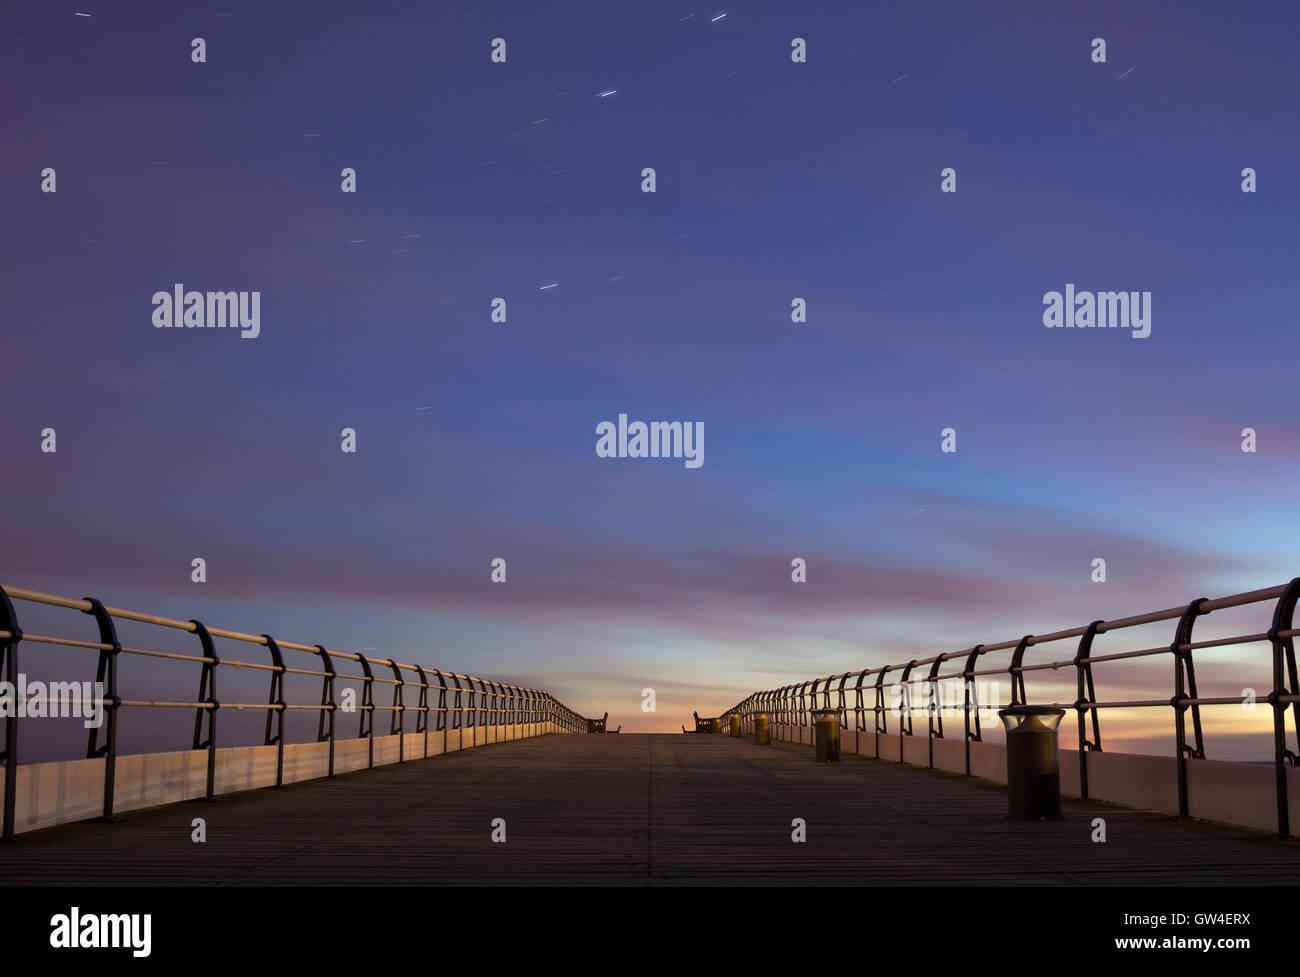 Pre dawn sky over Saltburn pier. Saltburn by the sea, North Yorkshire, England, UK. - Stock Image